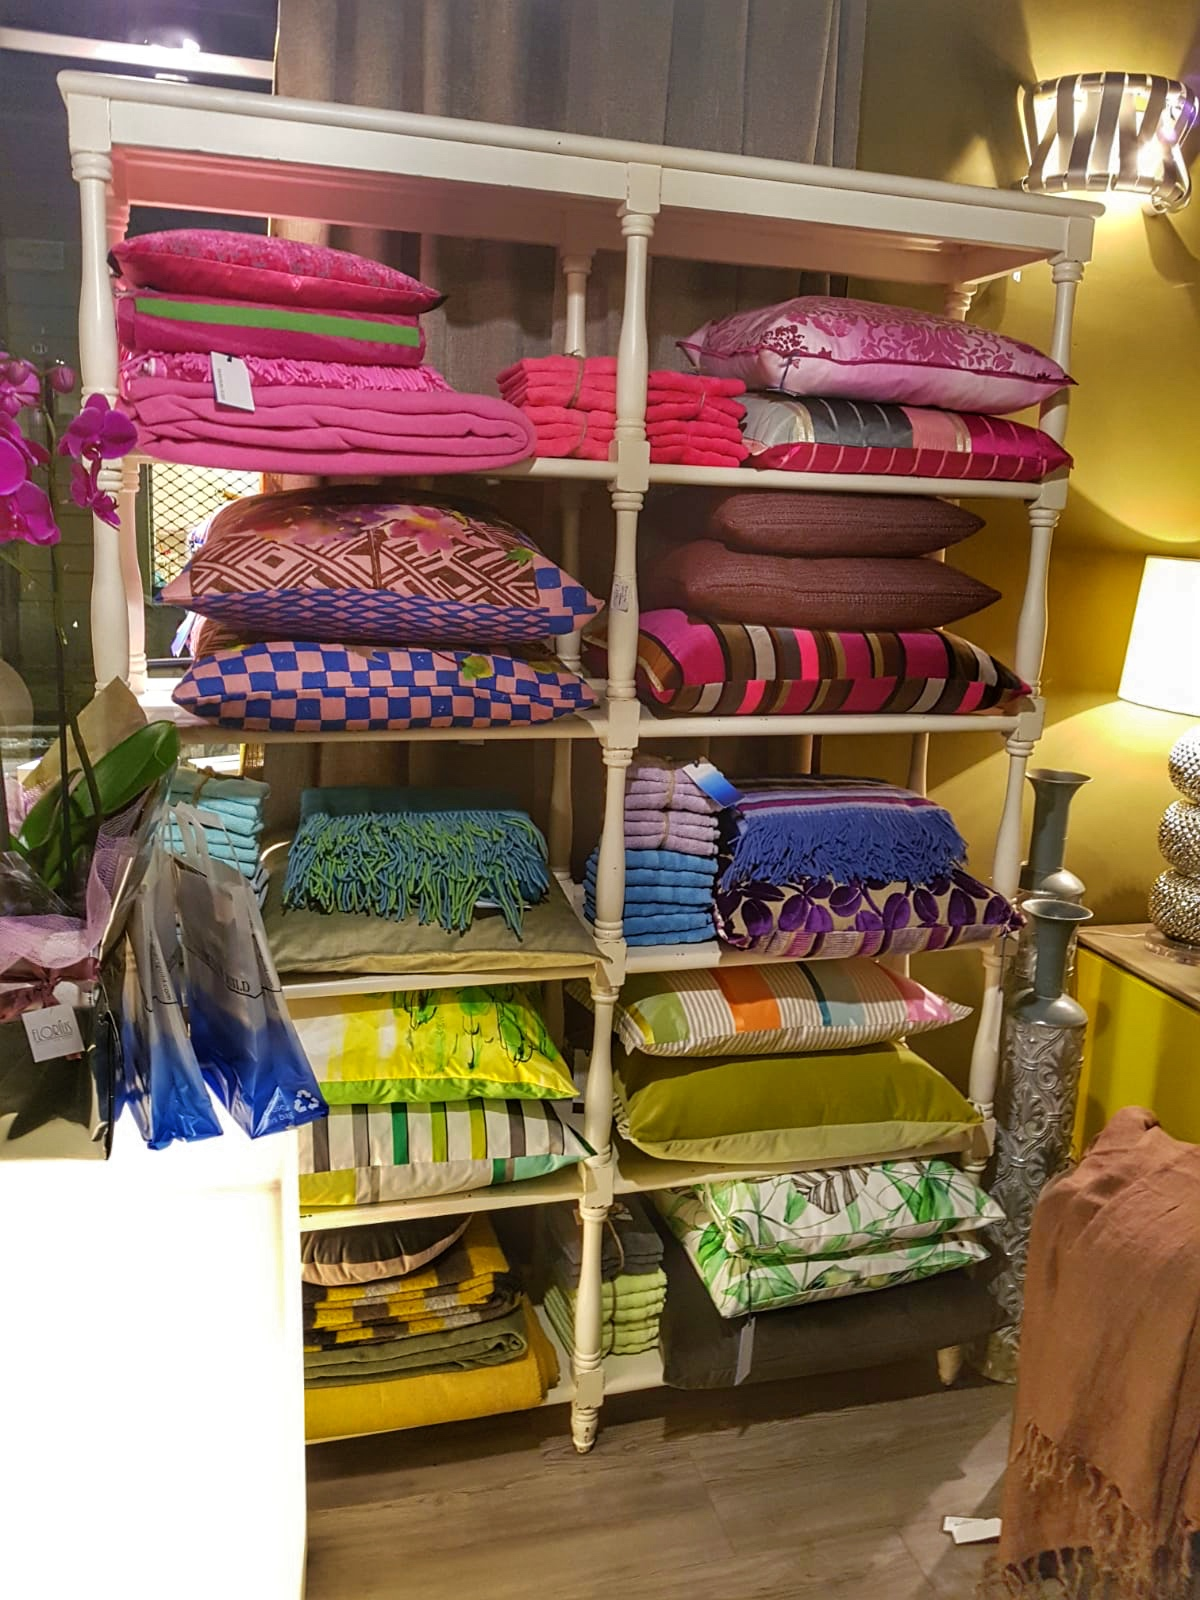 sara-rombola-pink-house-arredatrice-interior-designer-torino-talentieventi-19